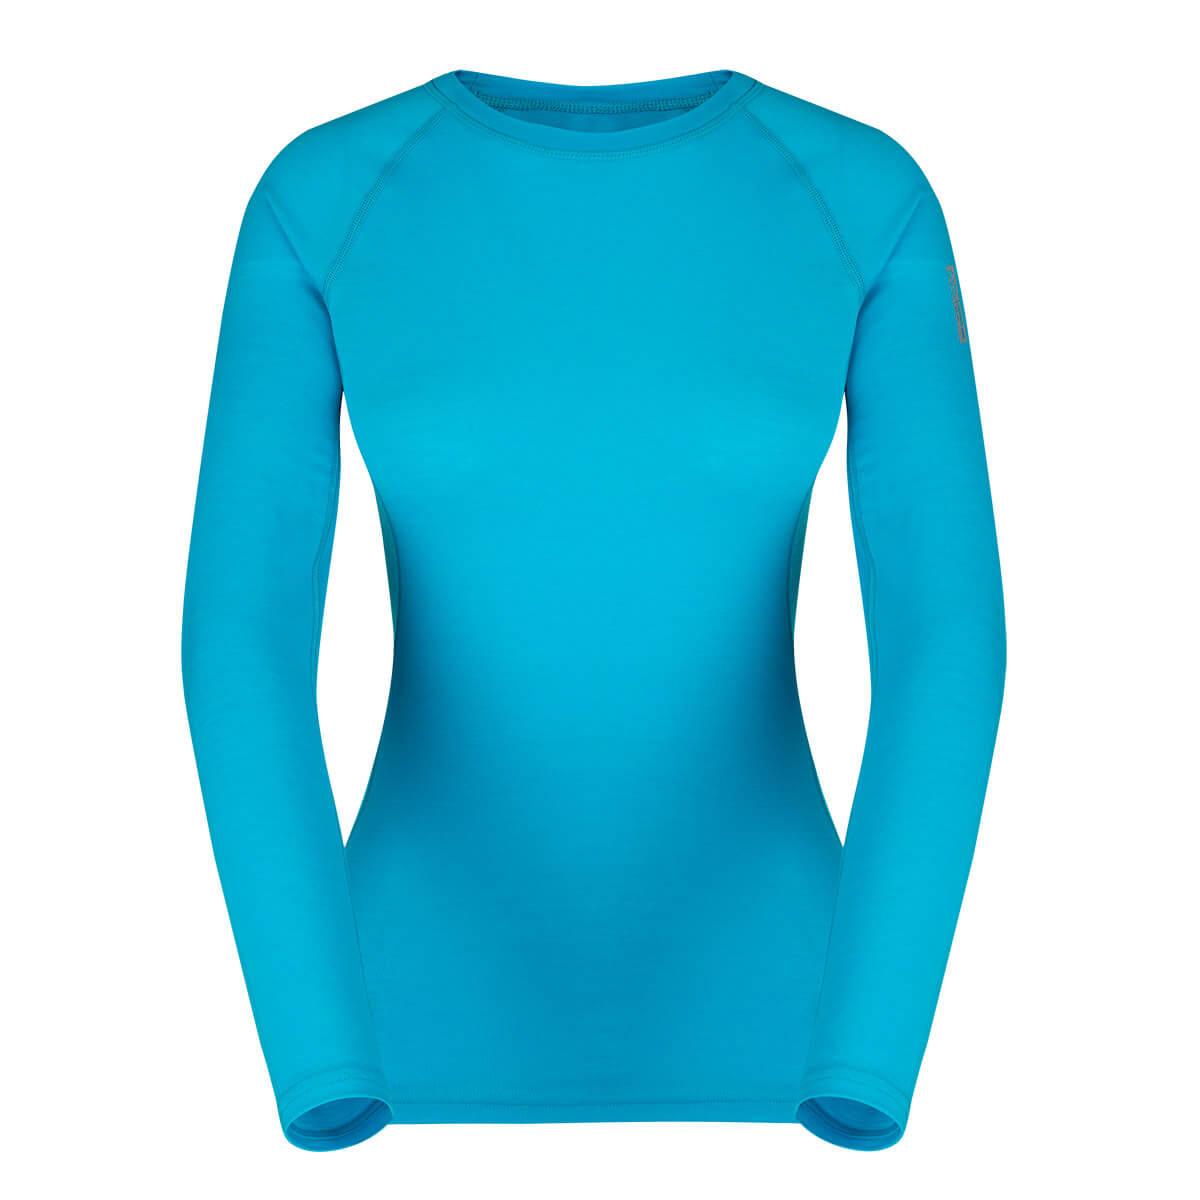 Dámske tričko Zajo Elsa Merino Nylon W T-shirt LS Curacao - veľkosť XS